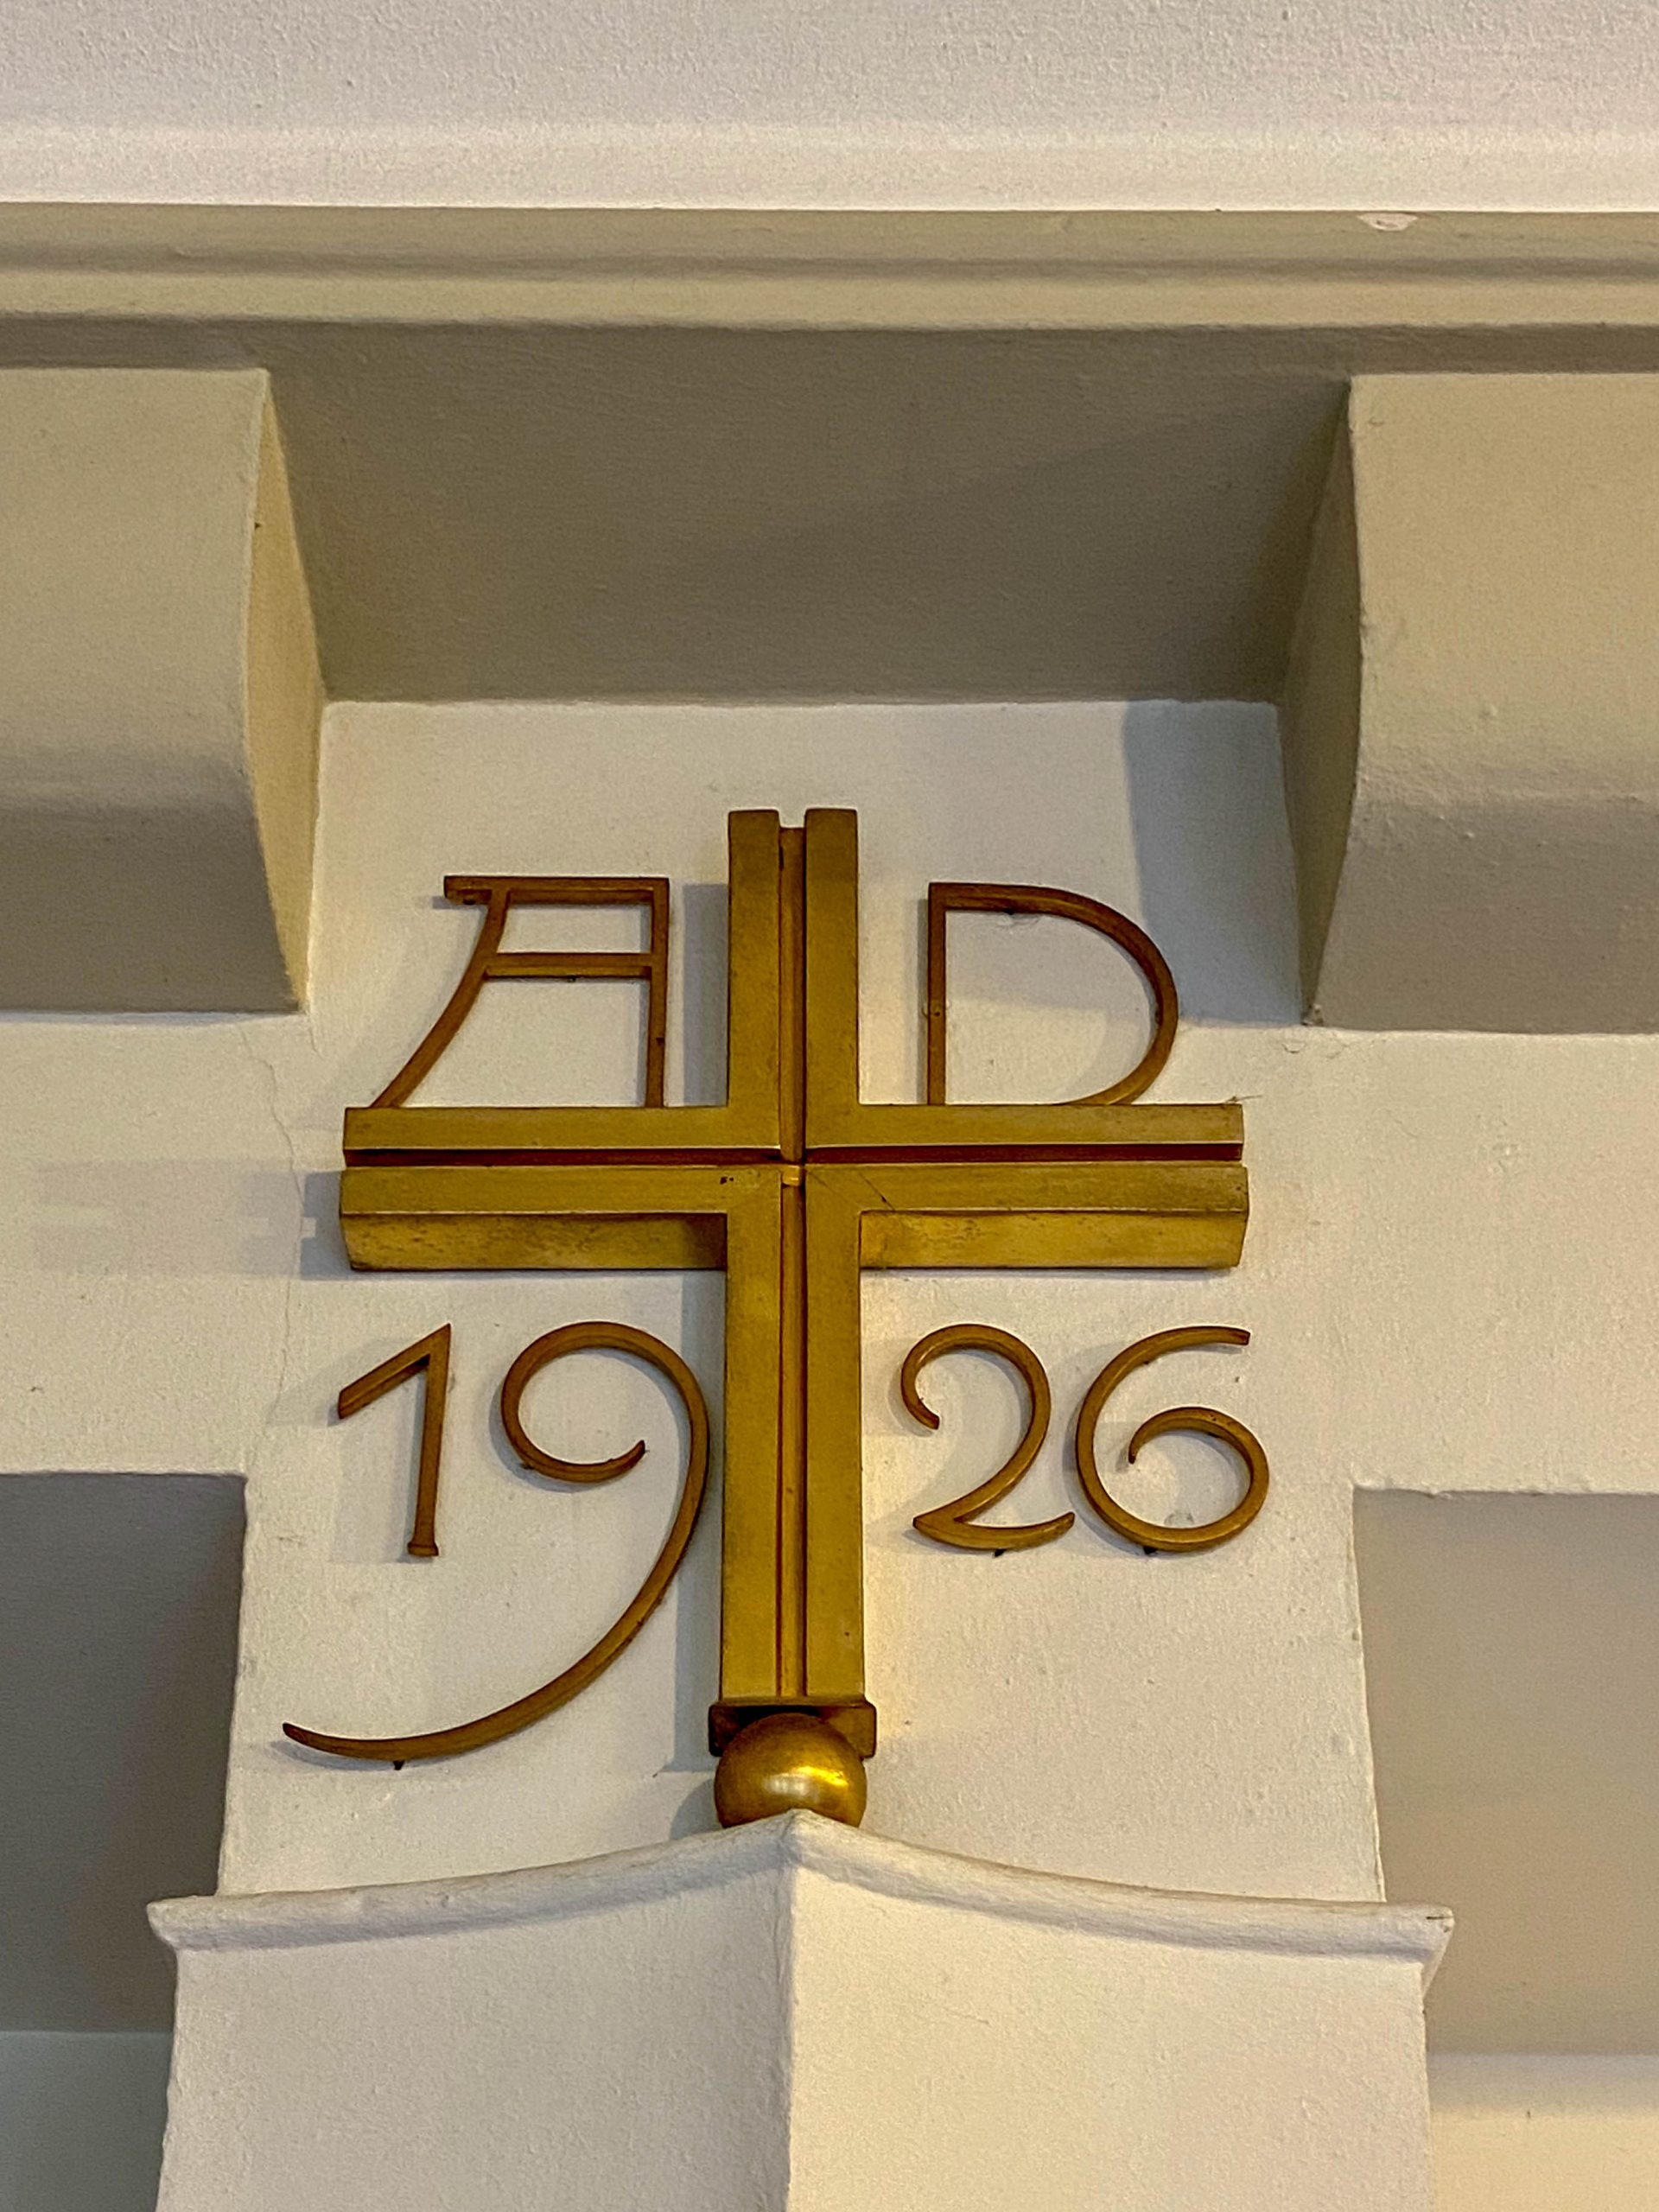 Protestant Südkirche, 1925-1926. Architect: Martin Elsaesser